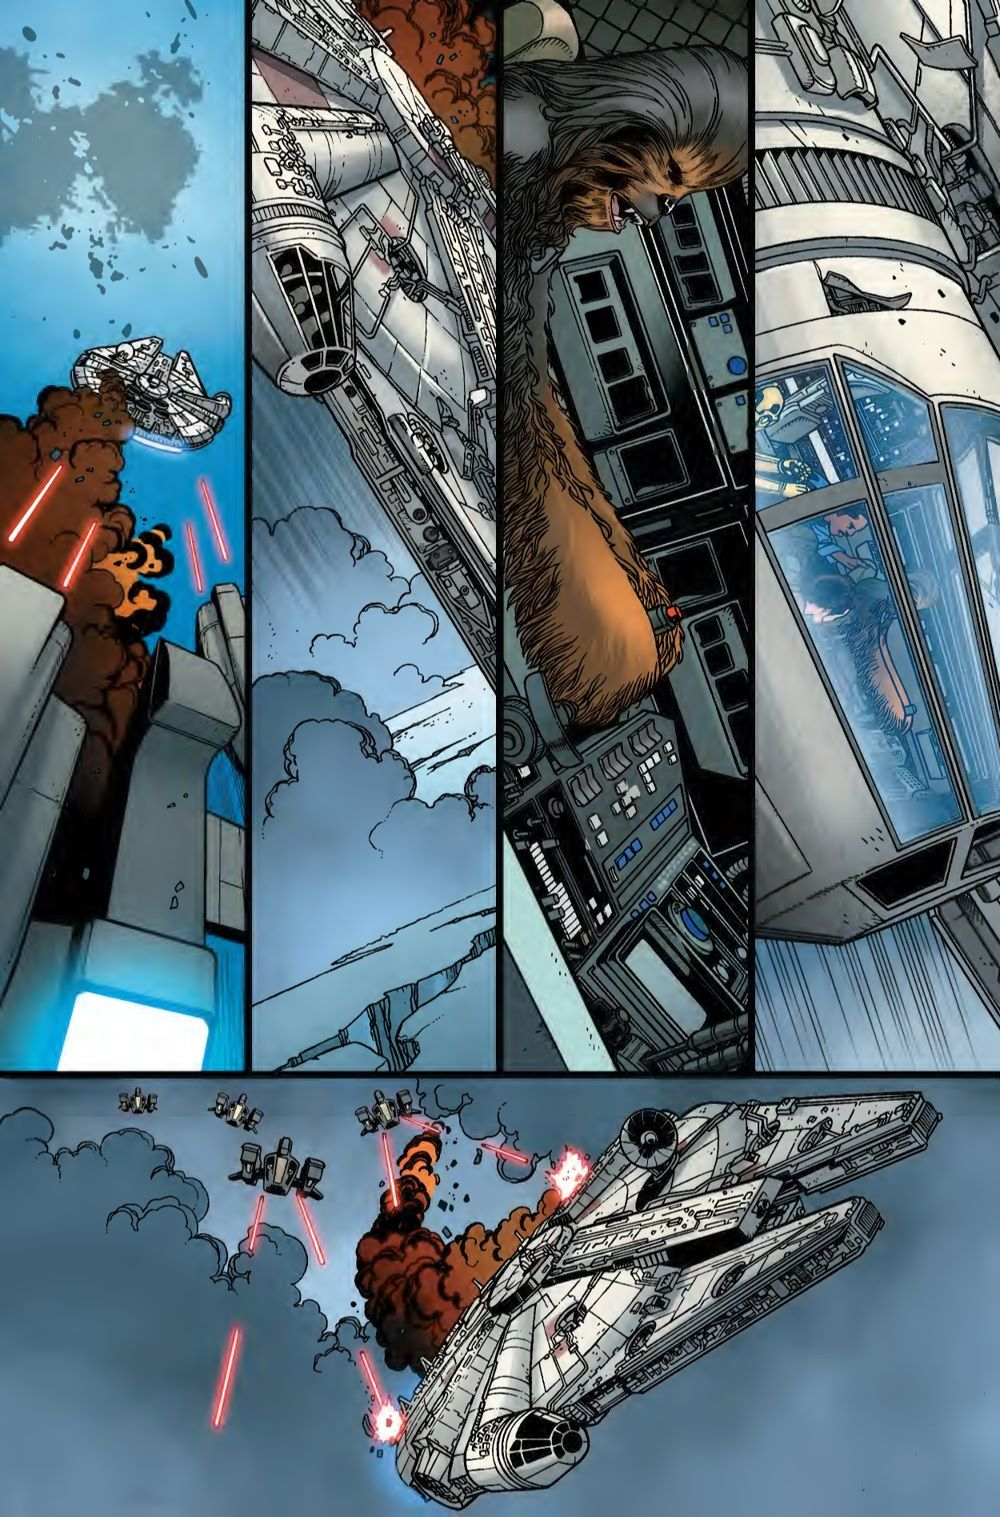 STWARS2020014_Preview-6 ComicList Previews: STAR WARS #14